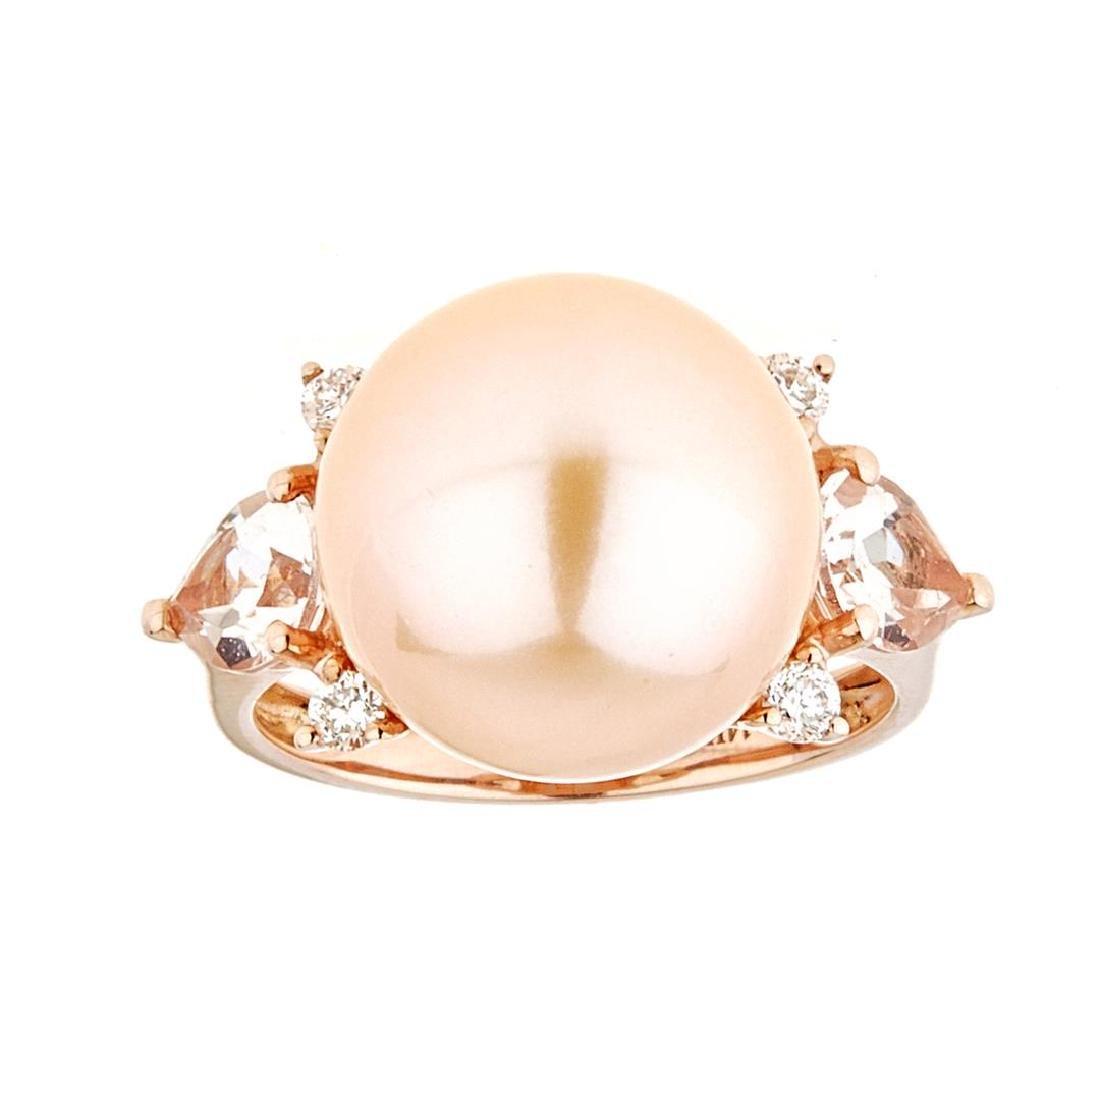 Pearl, Morganite and Diamond Ring - 14KT Rose Gold